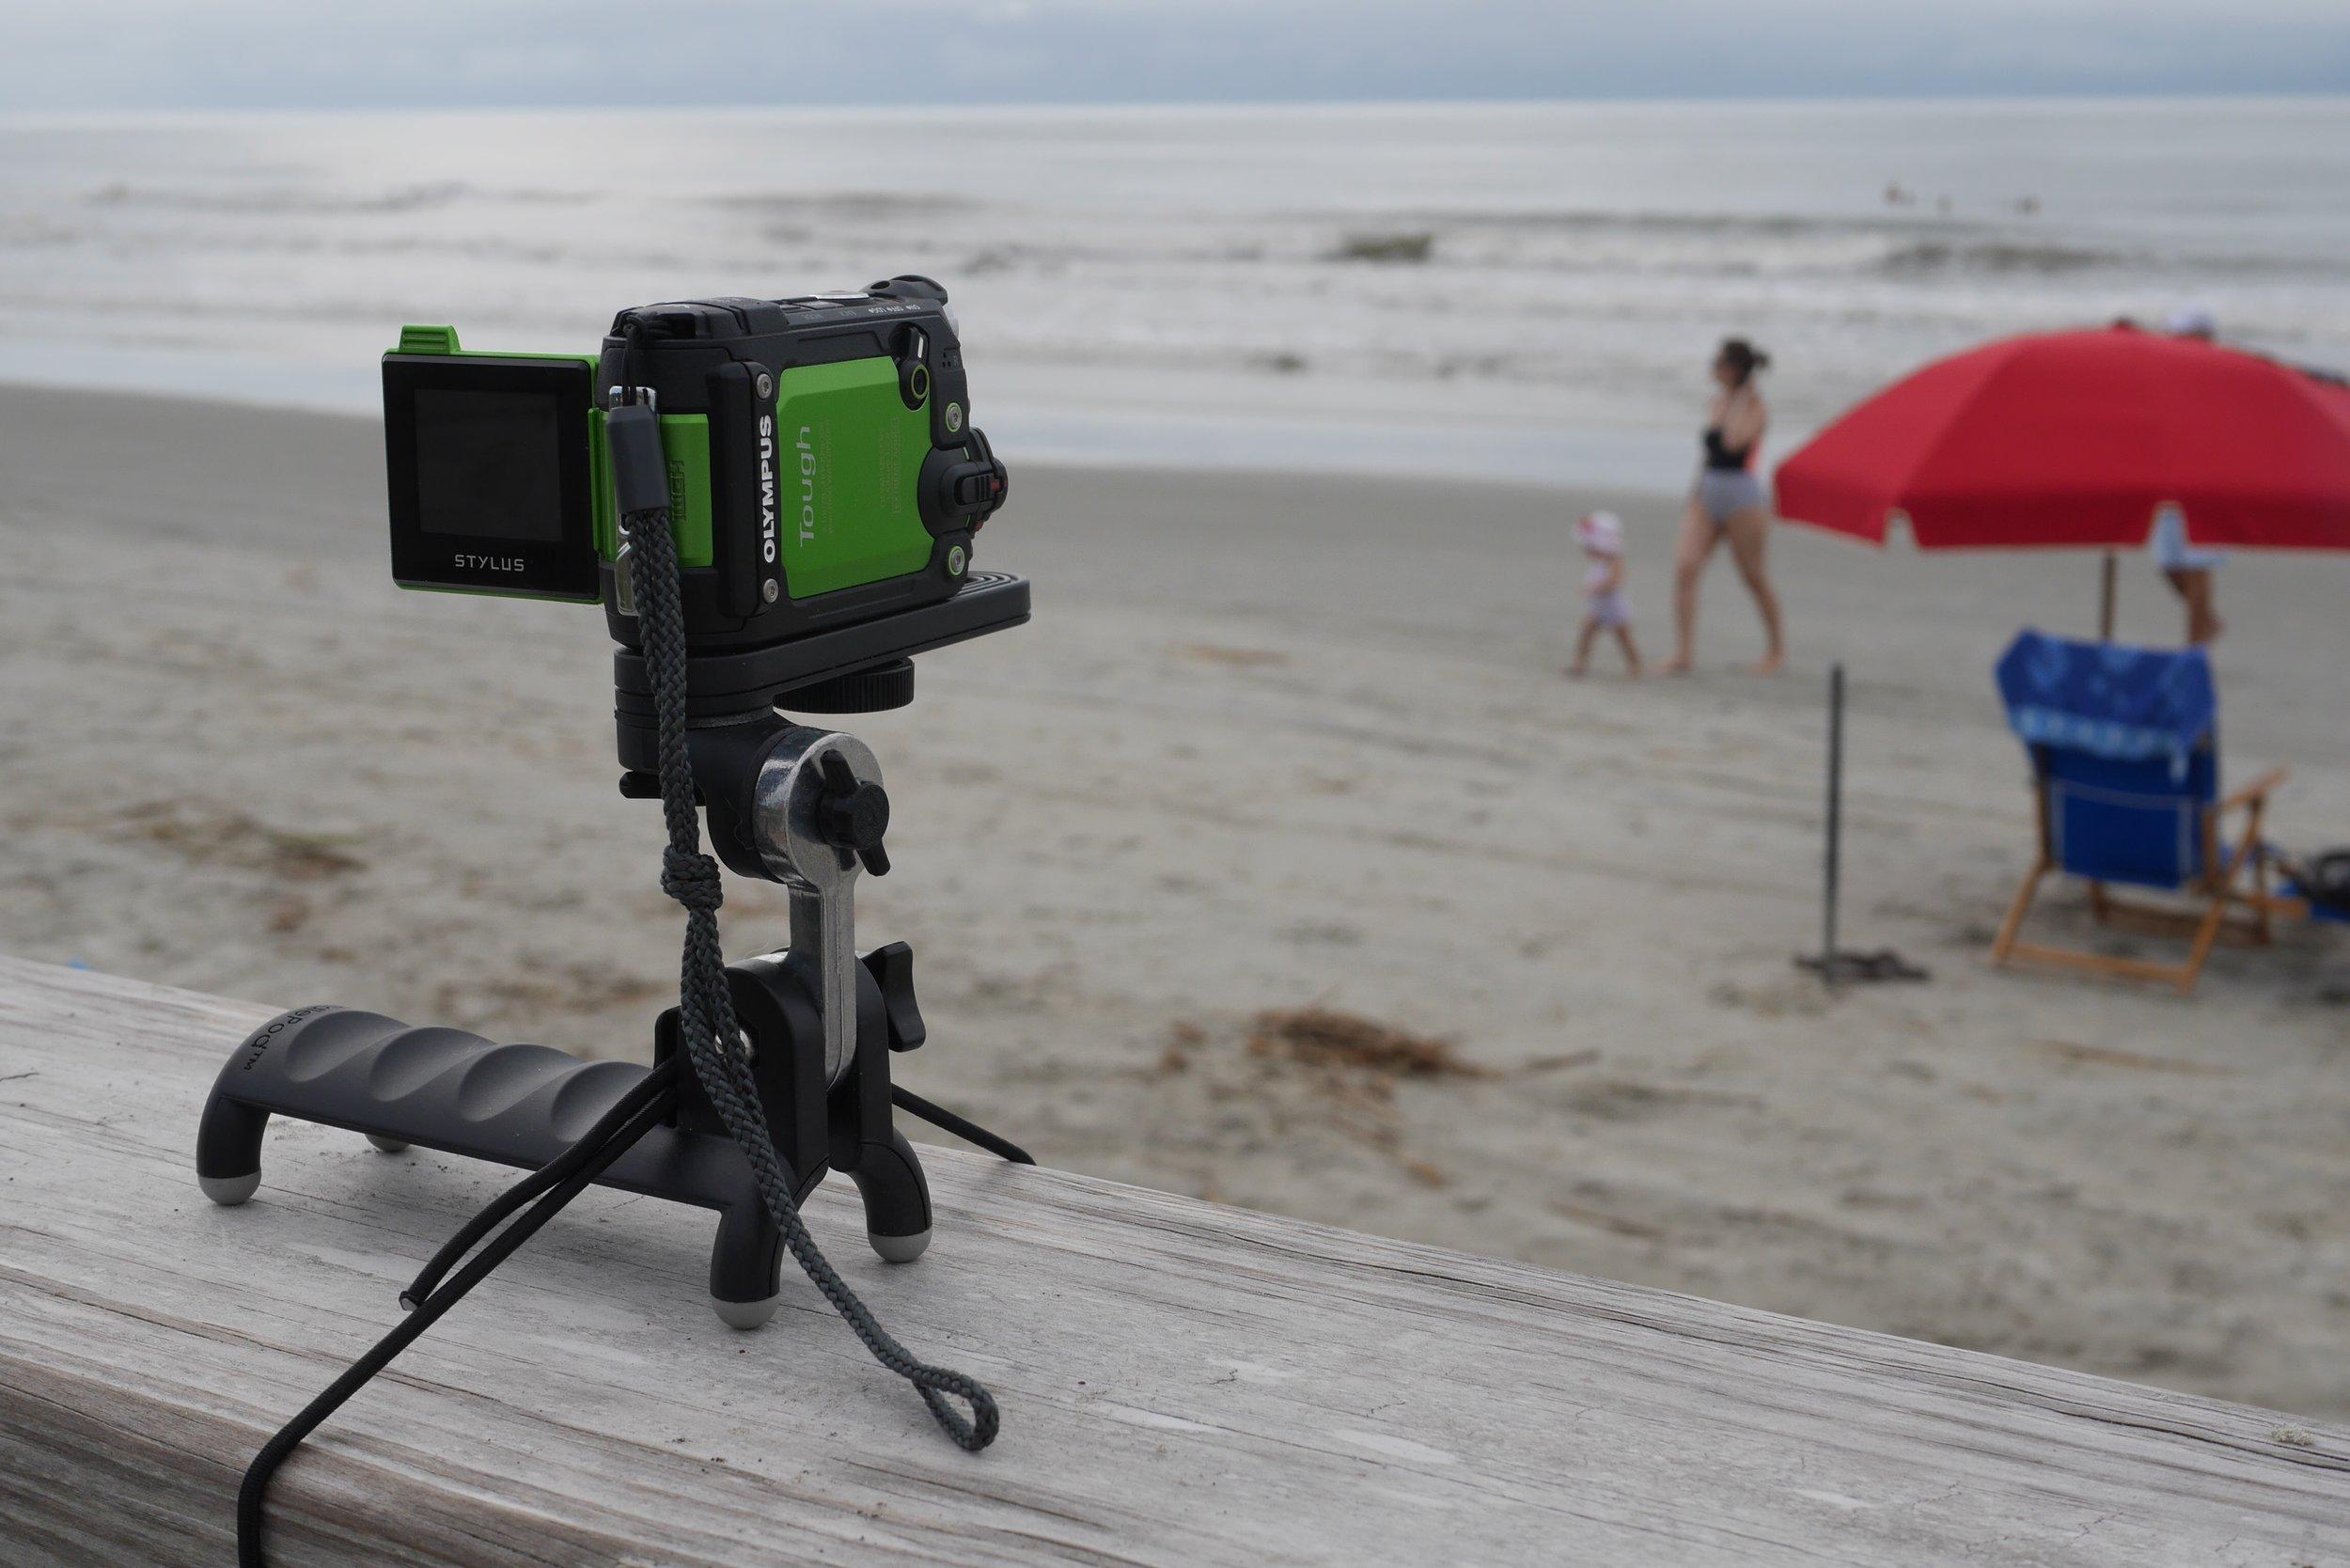 The HandlePod in action holding my Olympus Tough TG-Tracker on a beach boardwalk railing.